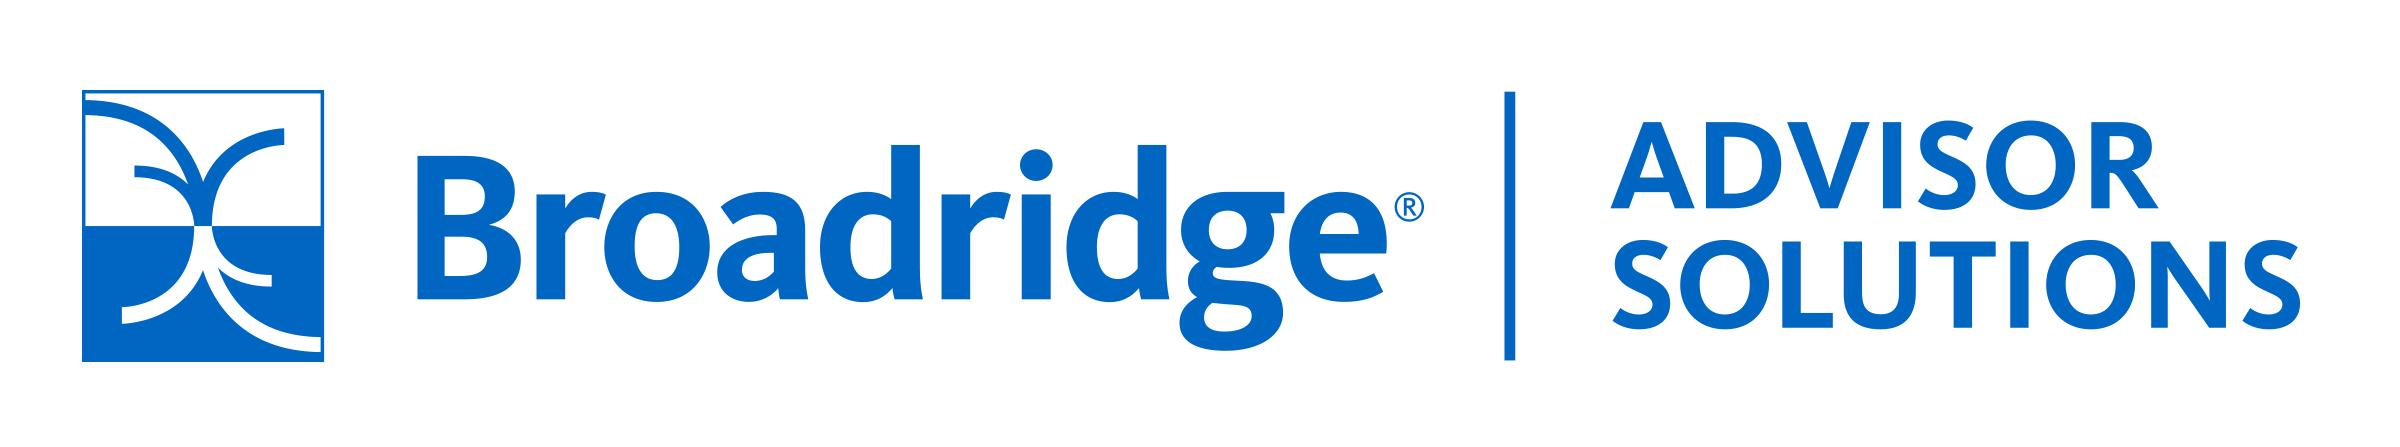 Broadridge Advisor Solutions